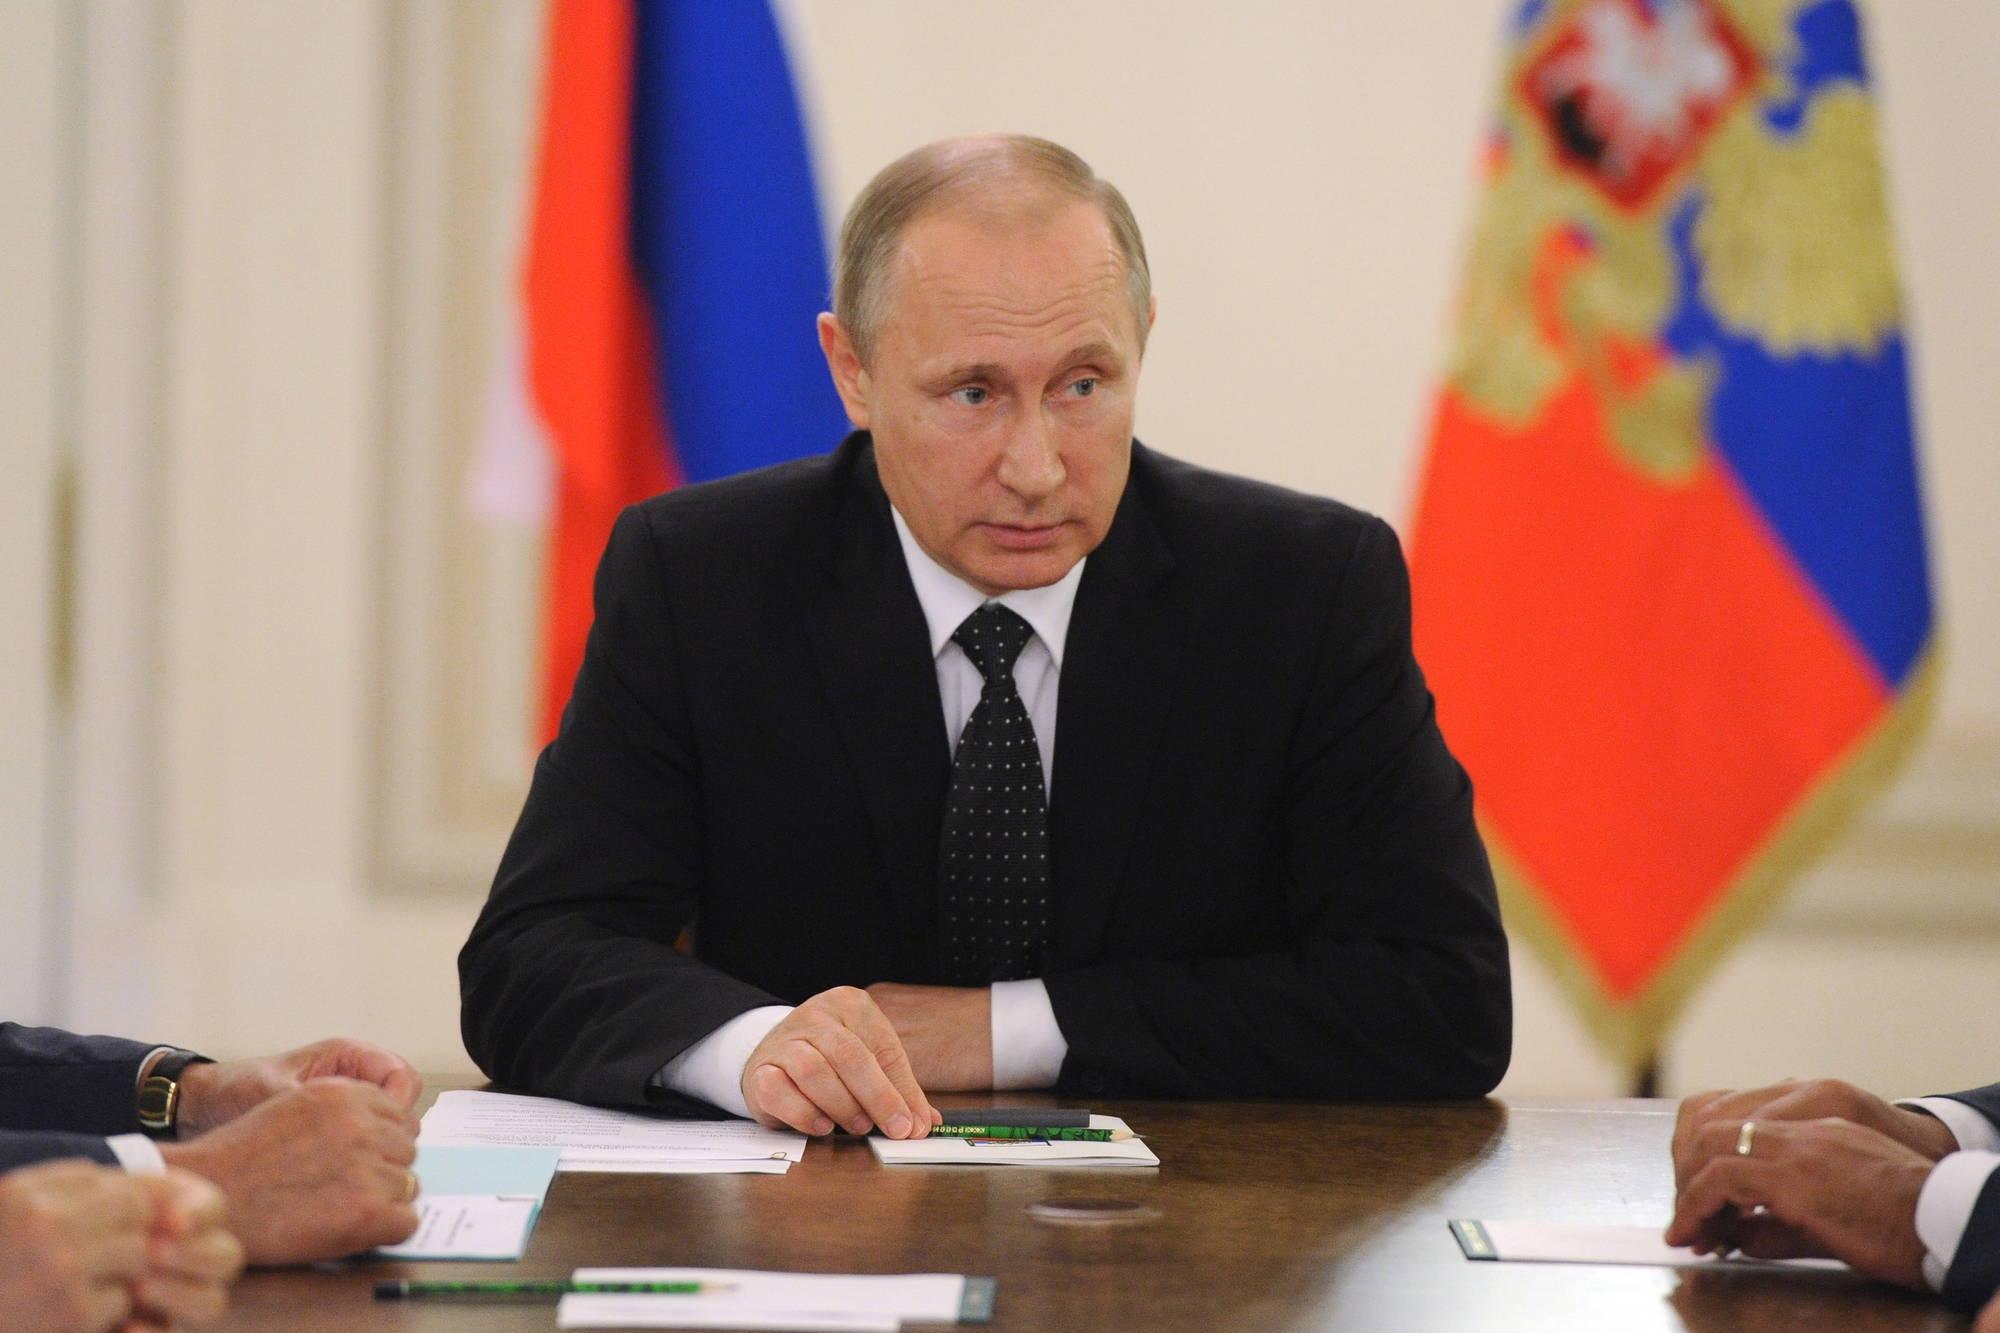 Quei bunker segreti di Putin: così prepara la guerra nucleare